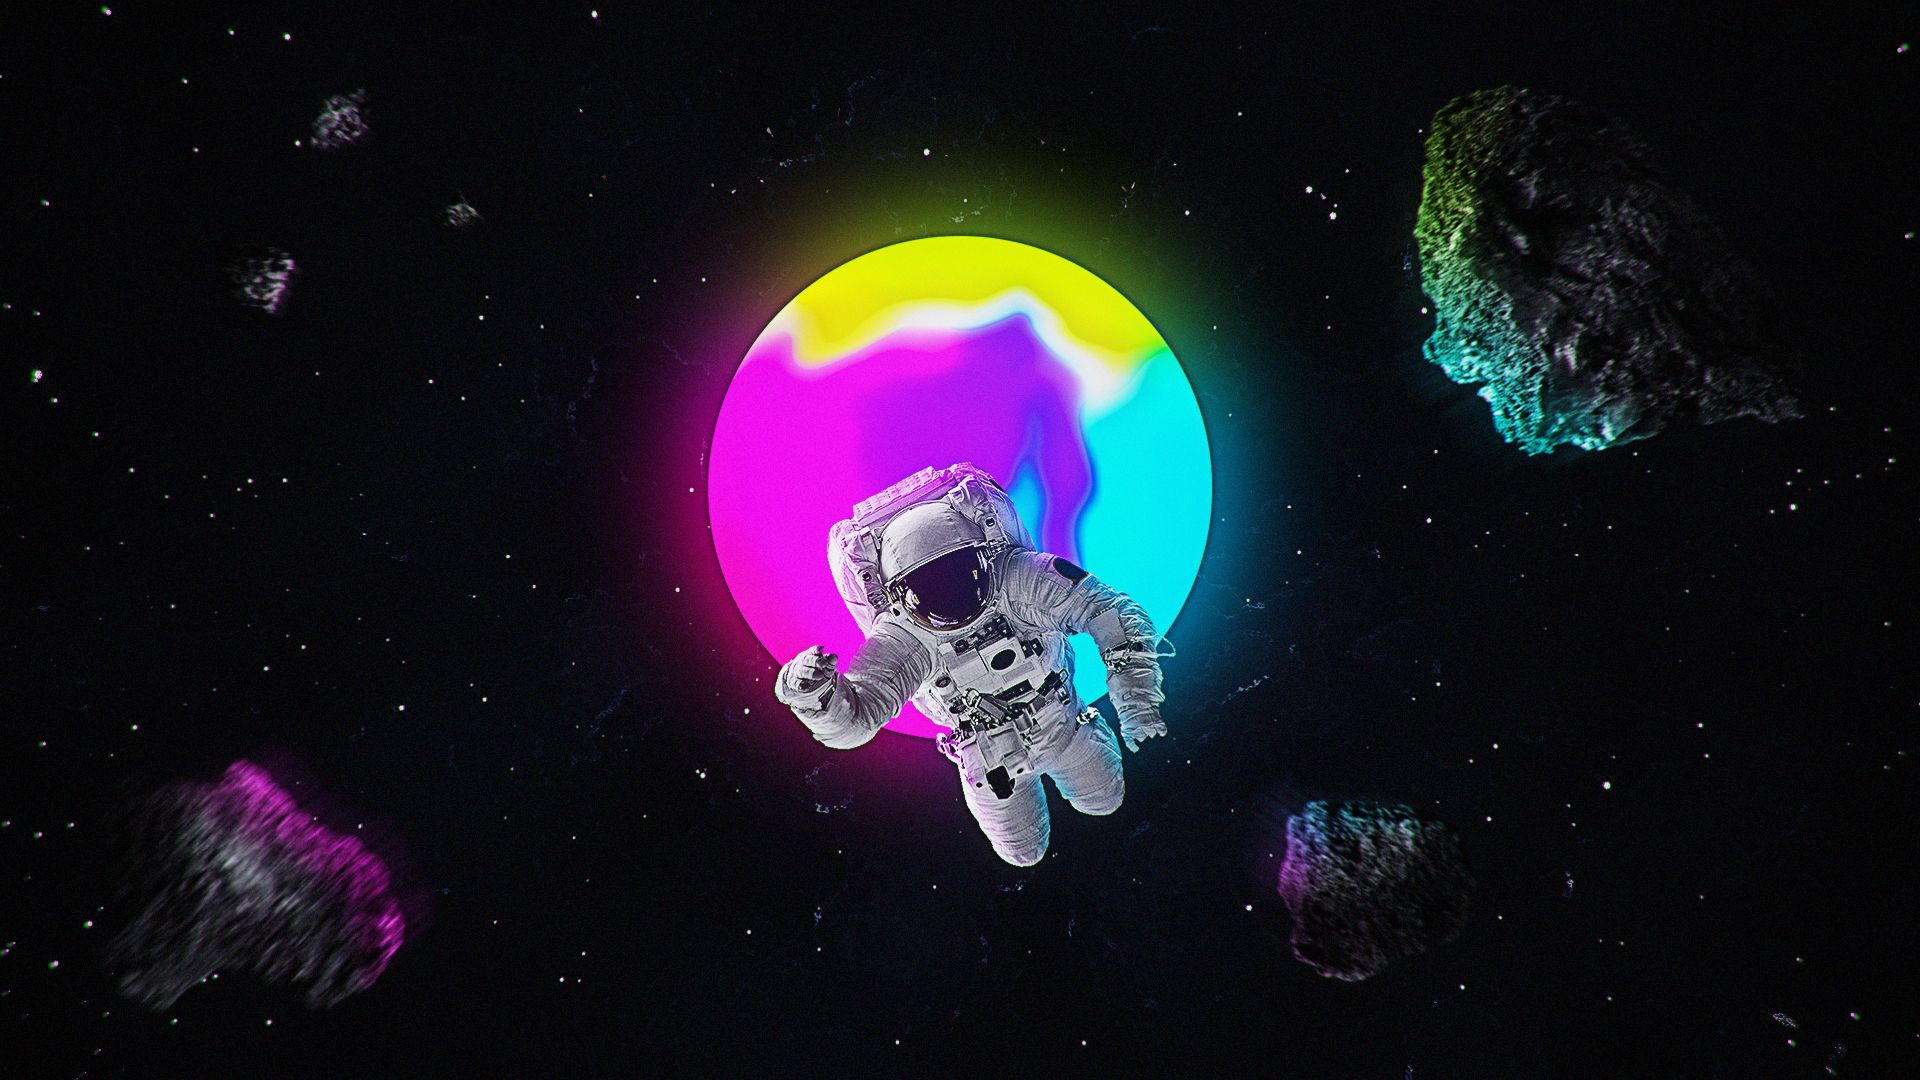 Cute Astronaut Wallpapers Top Free Cute Astronaut Backgrounds Wallpaperaccess